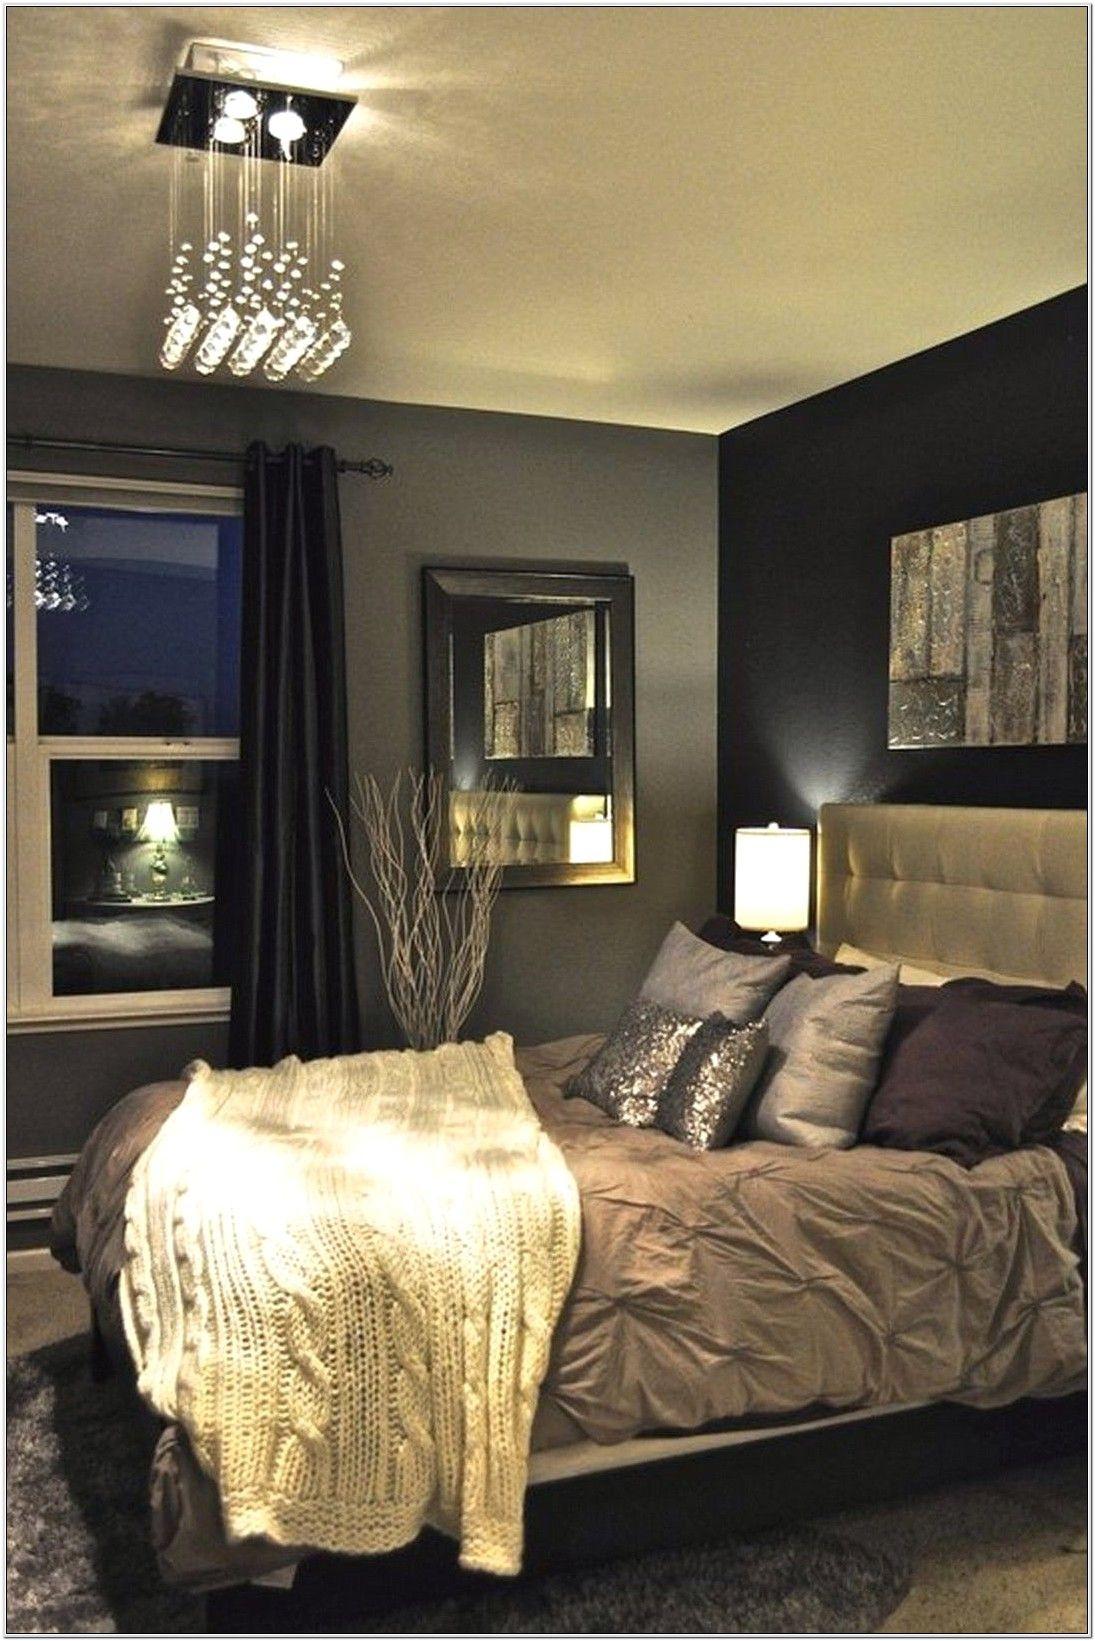 Bedroom Decorating Ideas 2017 In 2020 Bedroom Designs For Couples Bedroom Interior Woman Bedroom